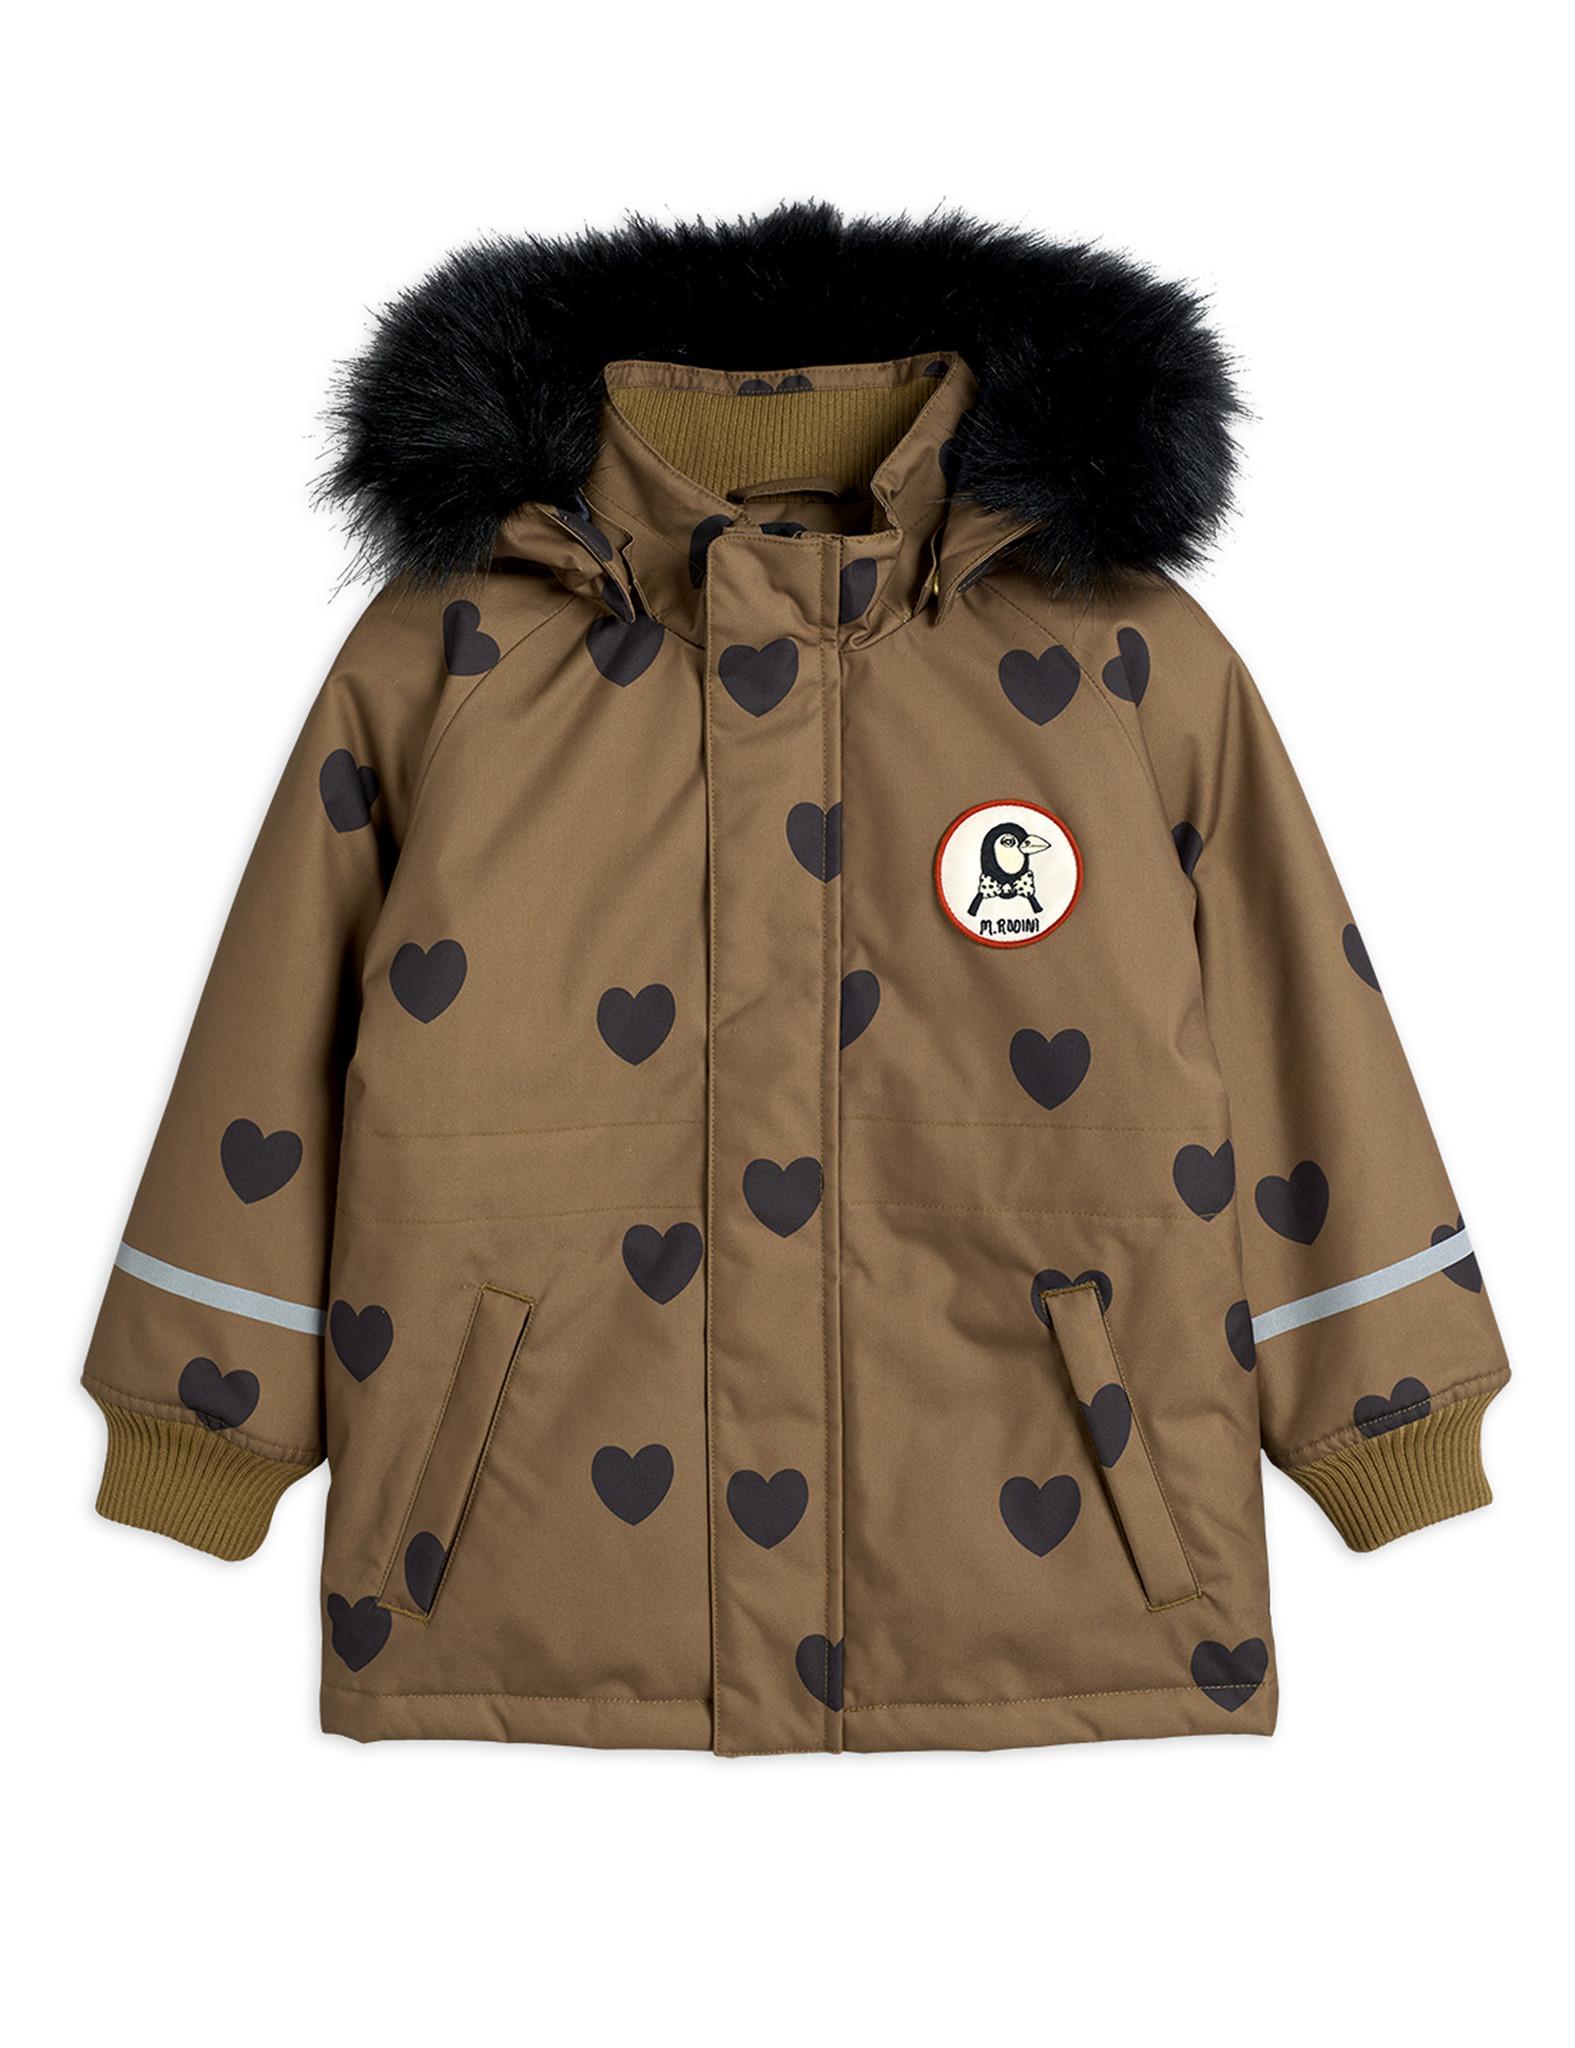 K2 hearts parka - Brown-1